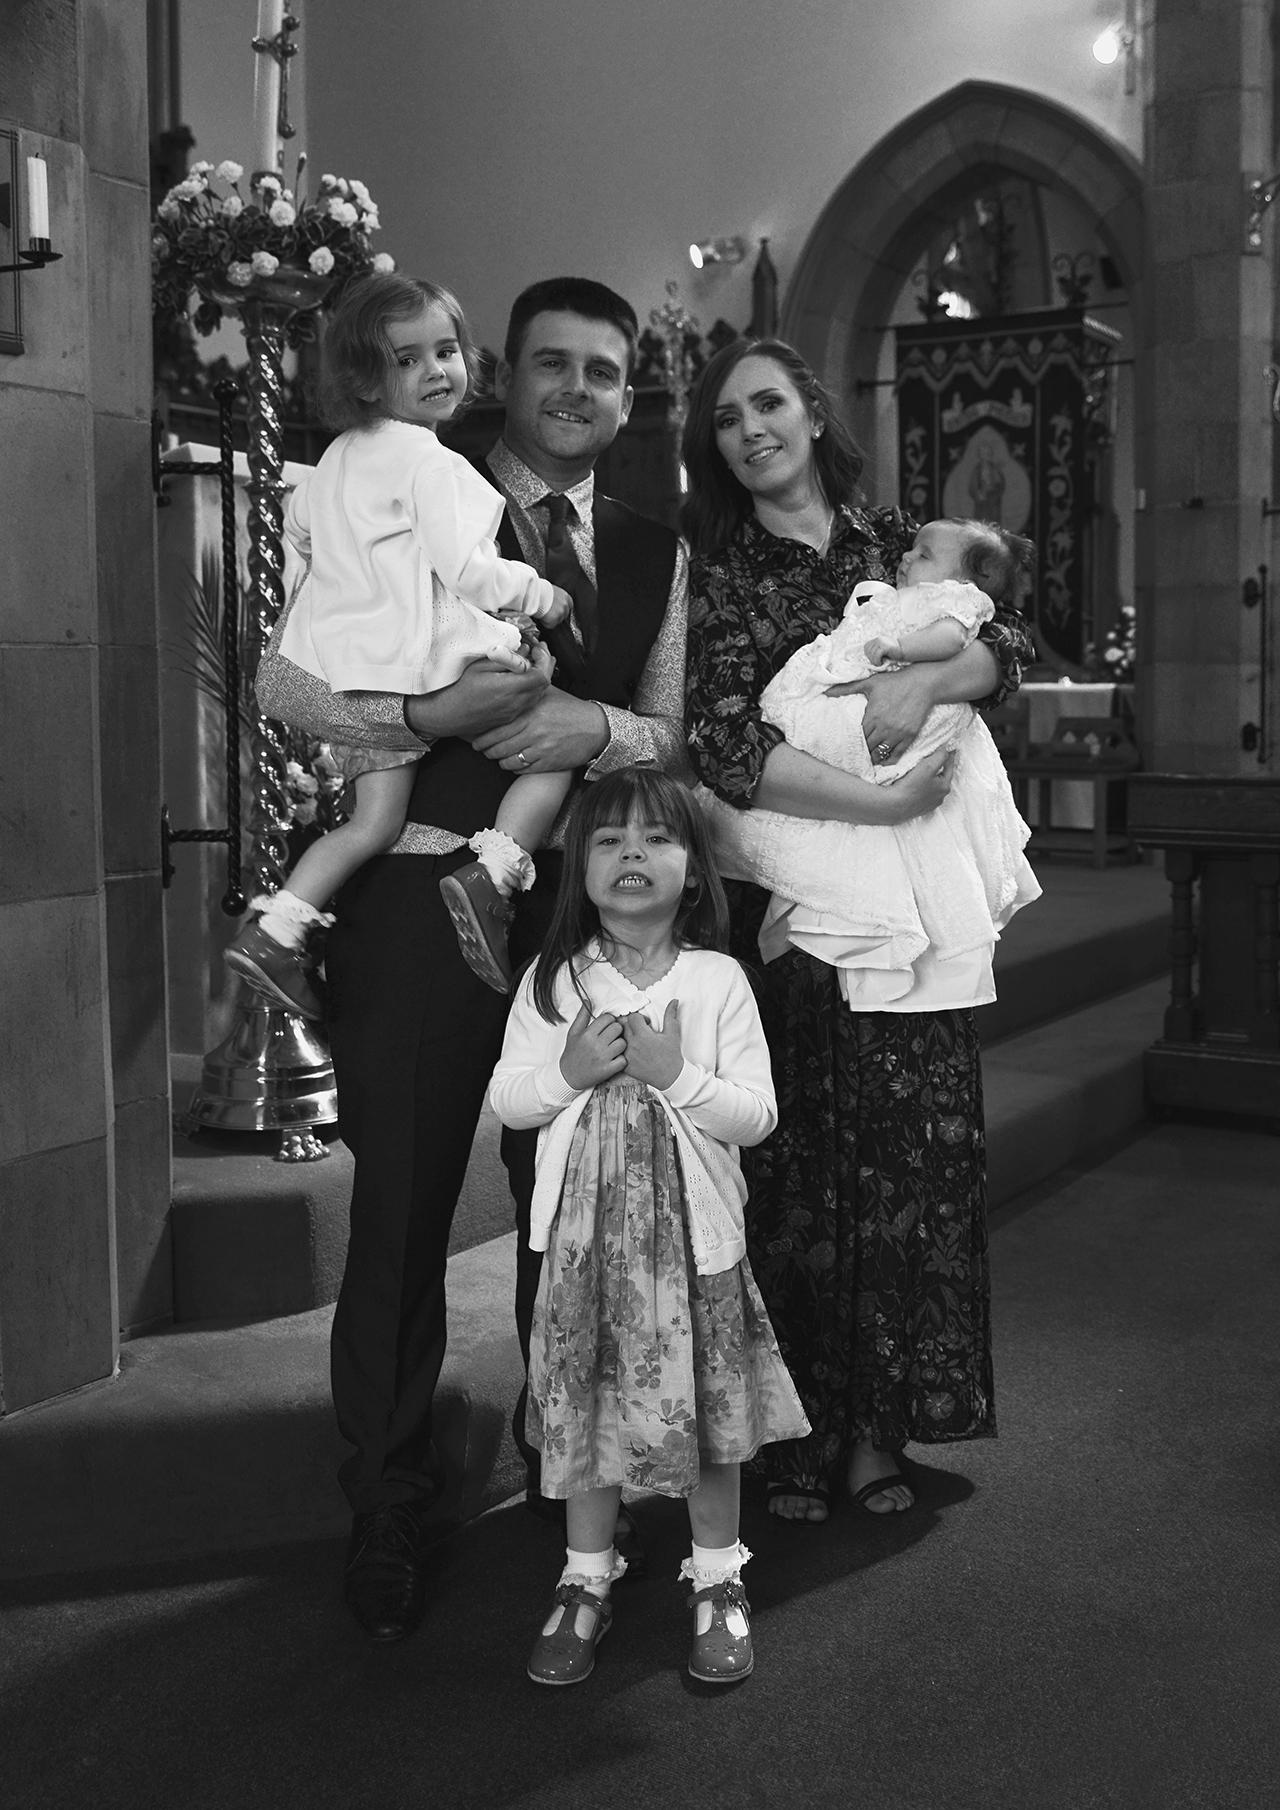 christening-baptism-photography_23.jpg